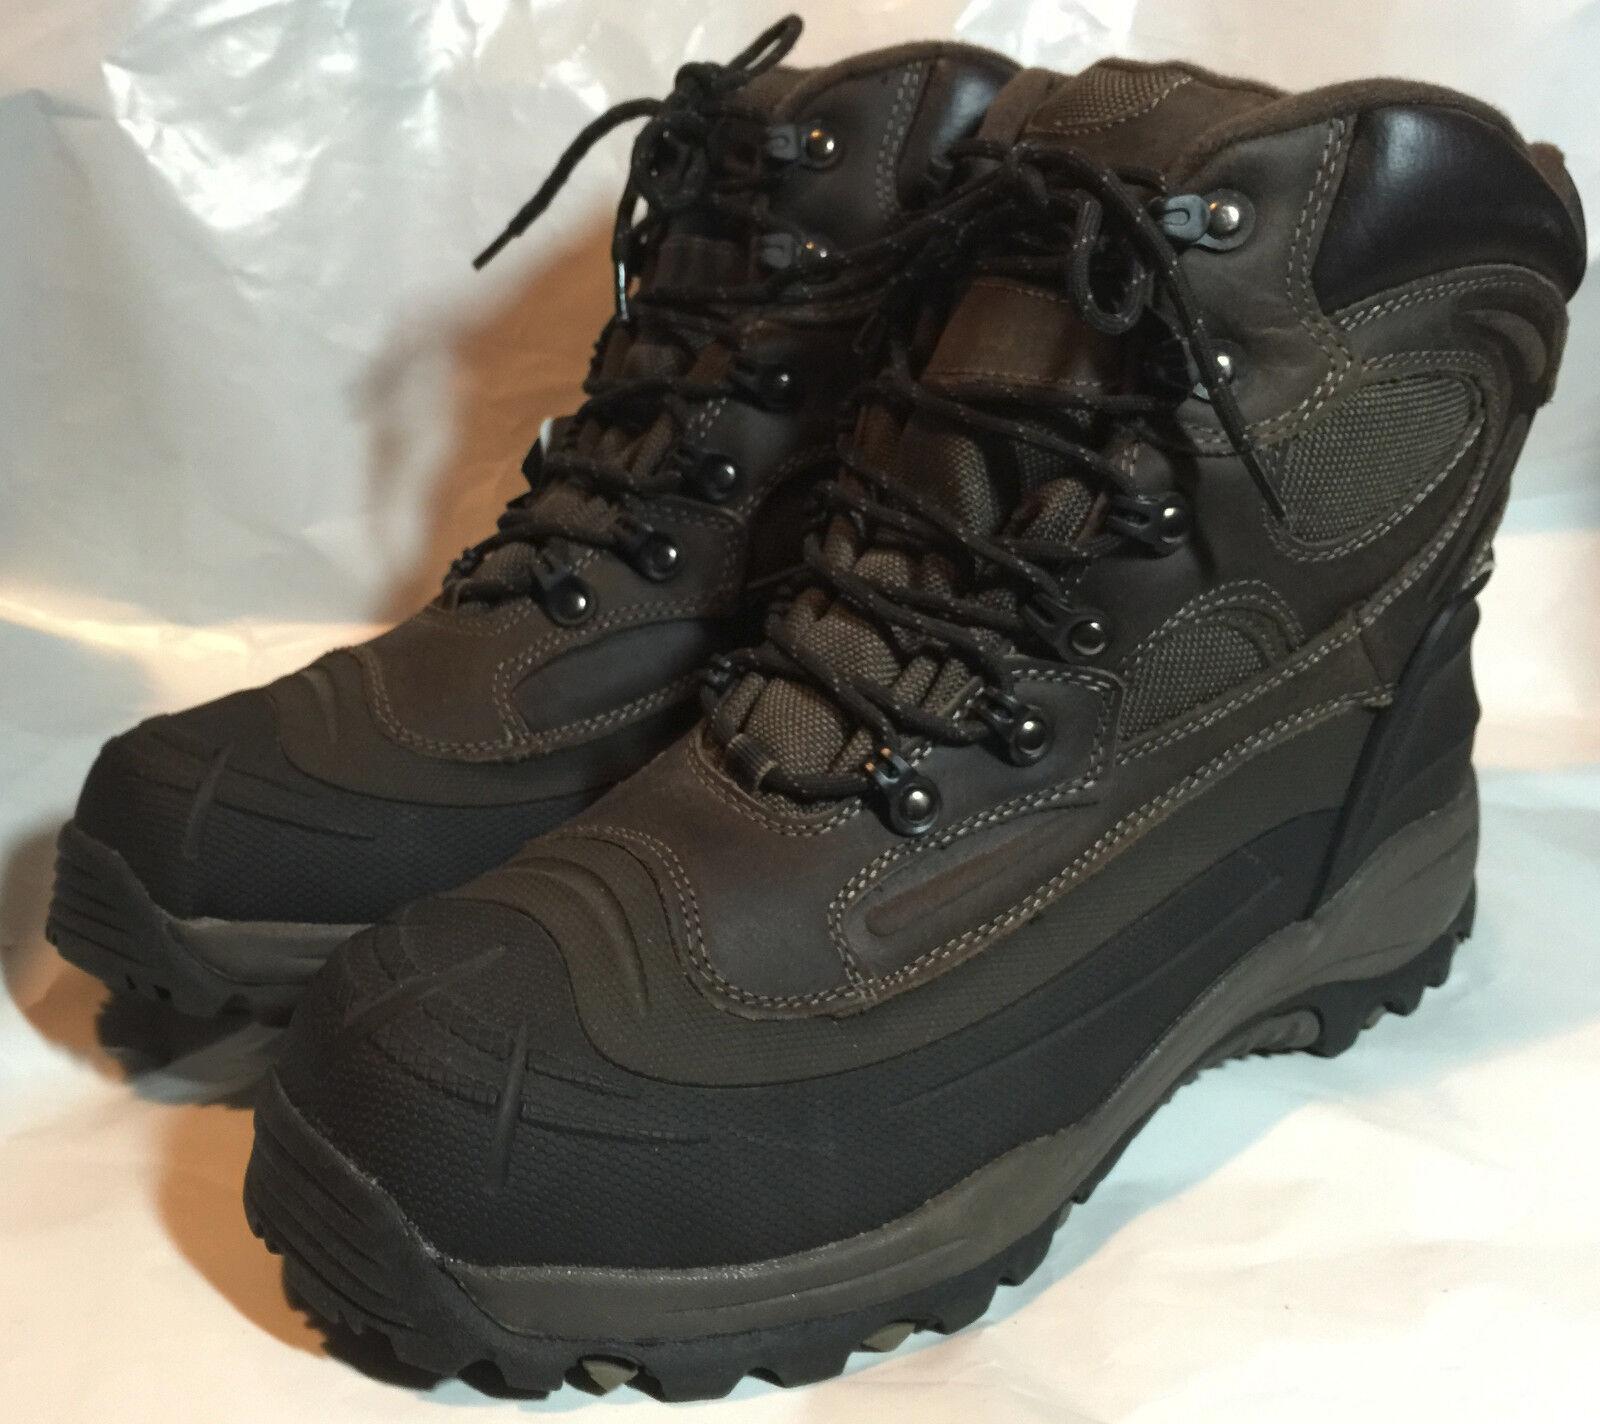 Weatherproof TREMOR BROWN Men's Insulated Waterproof Snow Winter Leather Boots